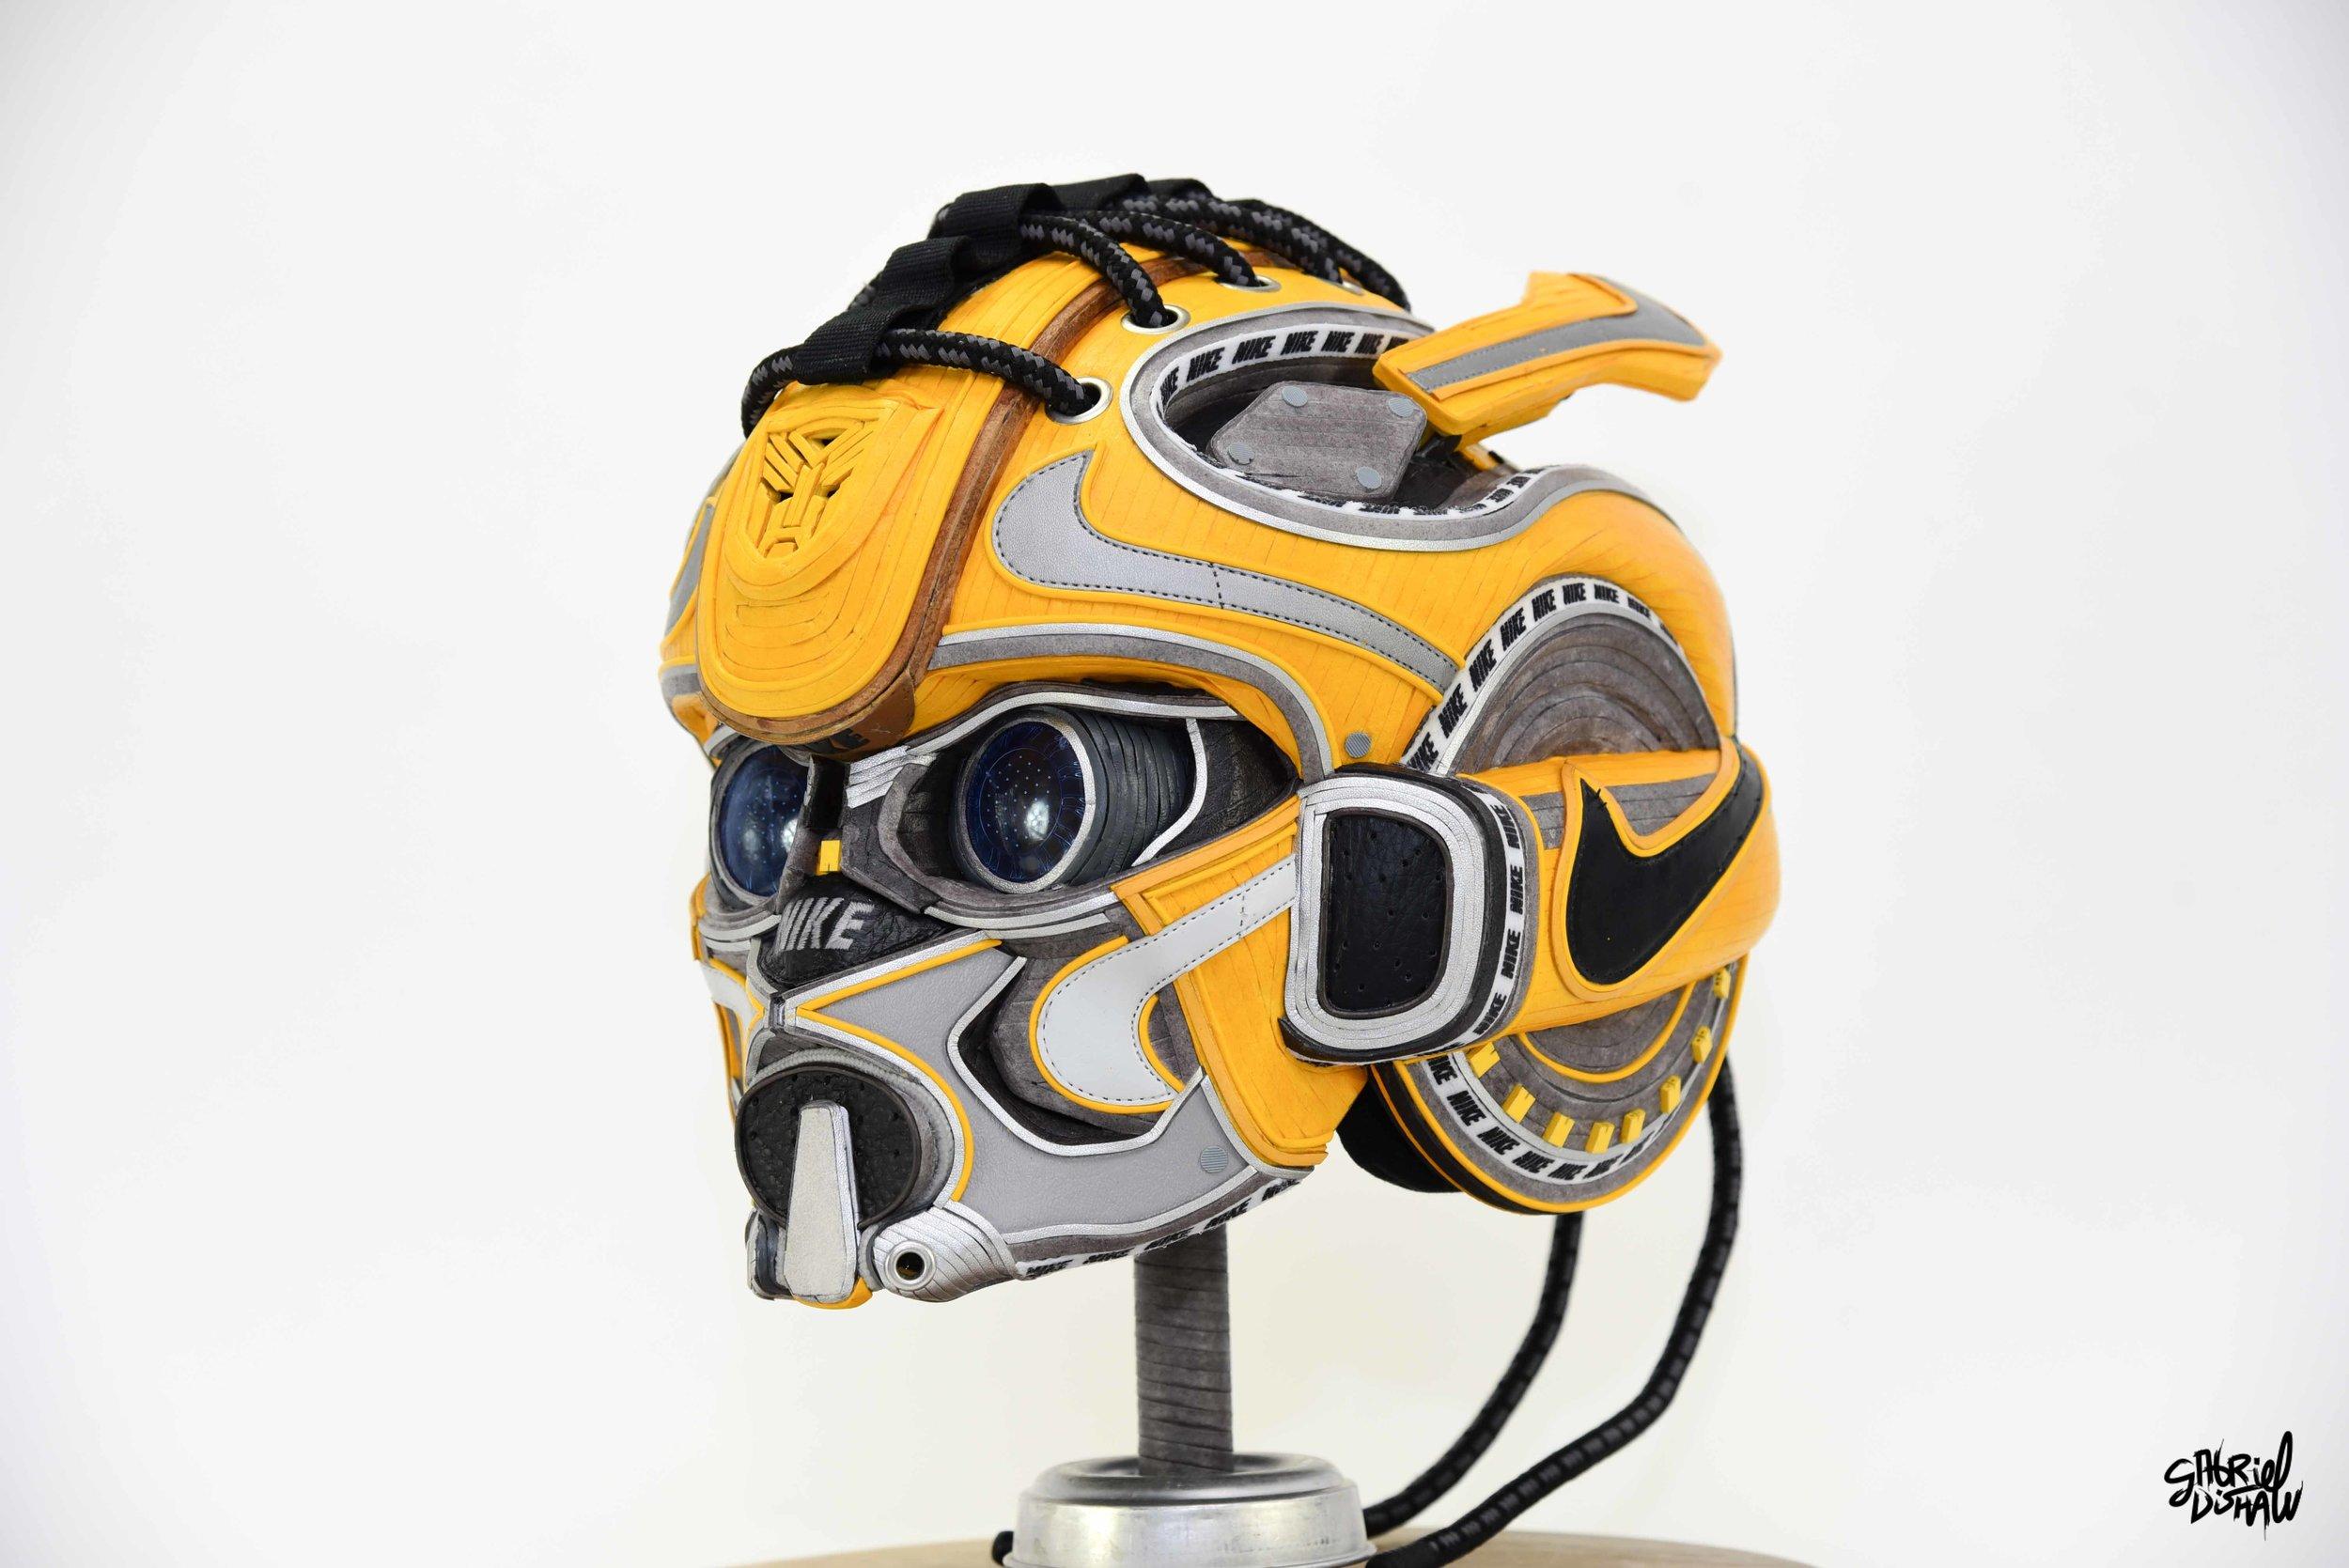 Gabriel Dishaw Bumblebee Swoosh-8600.jpg